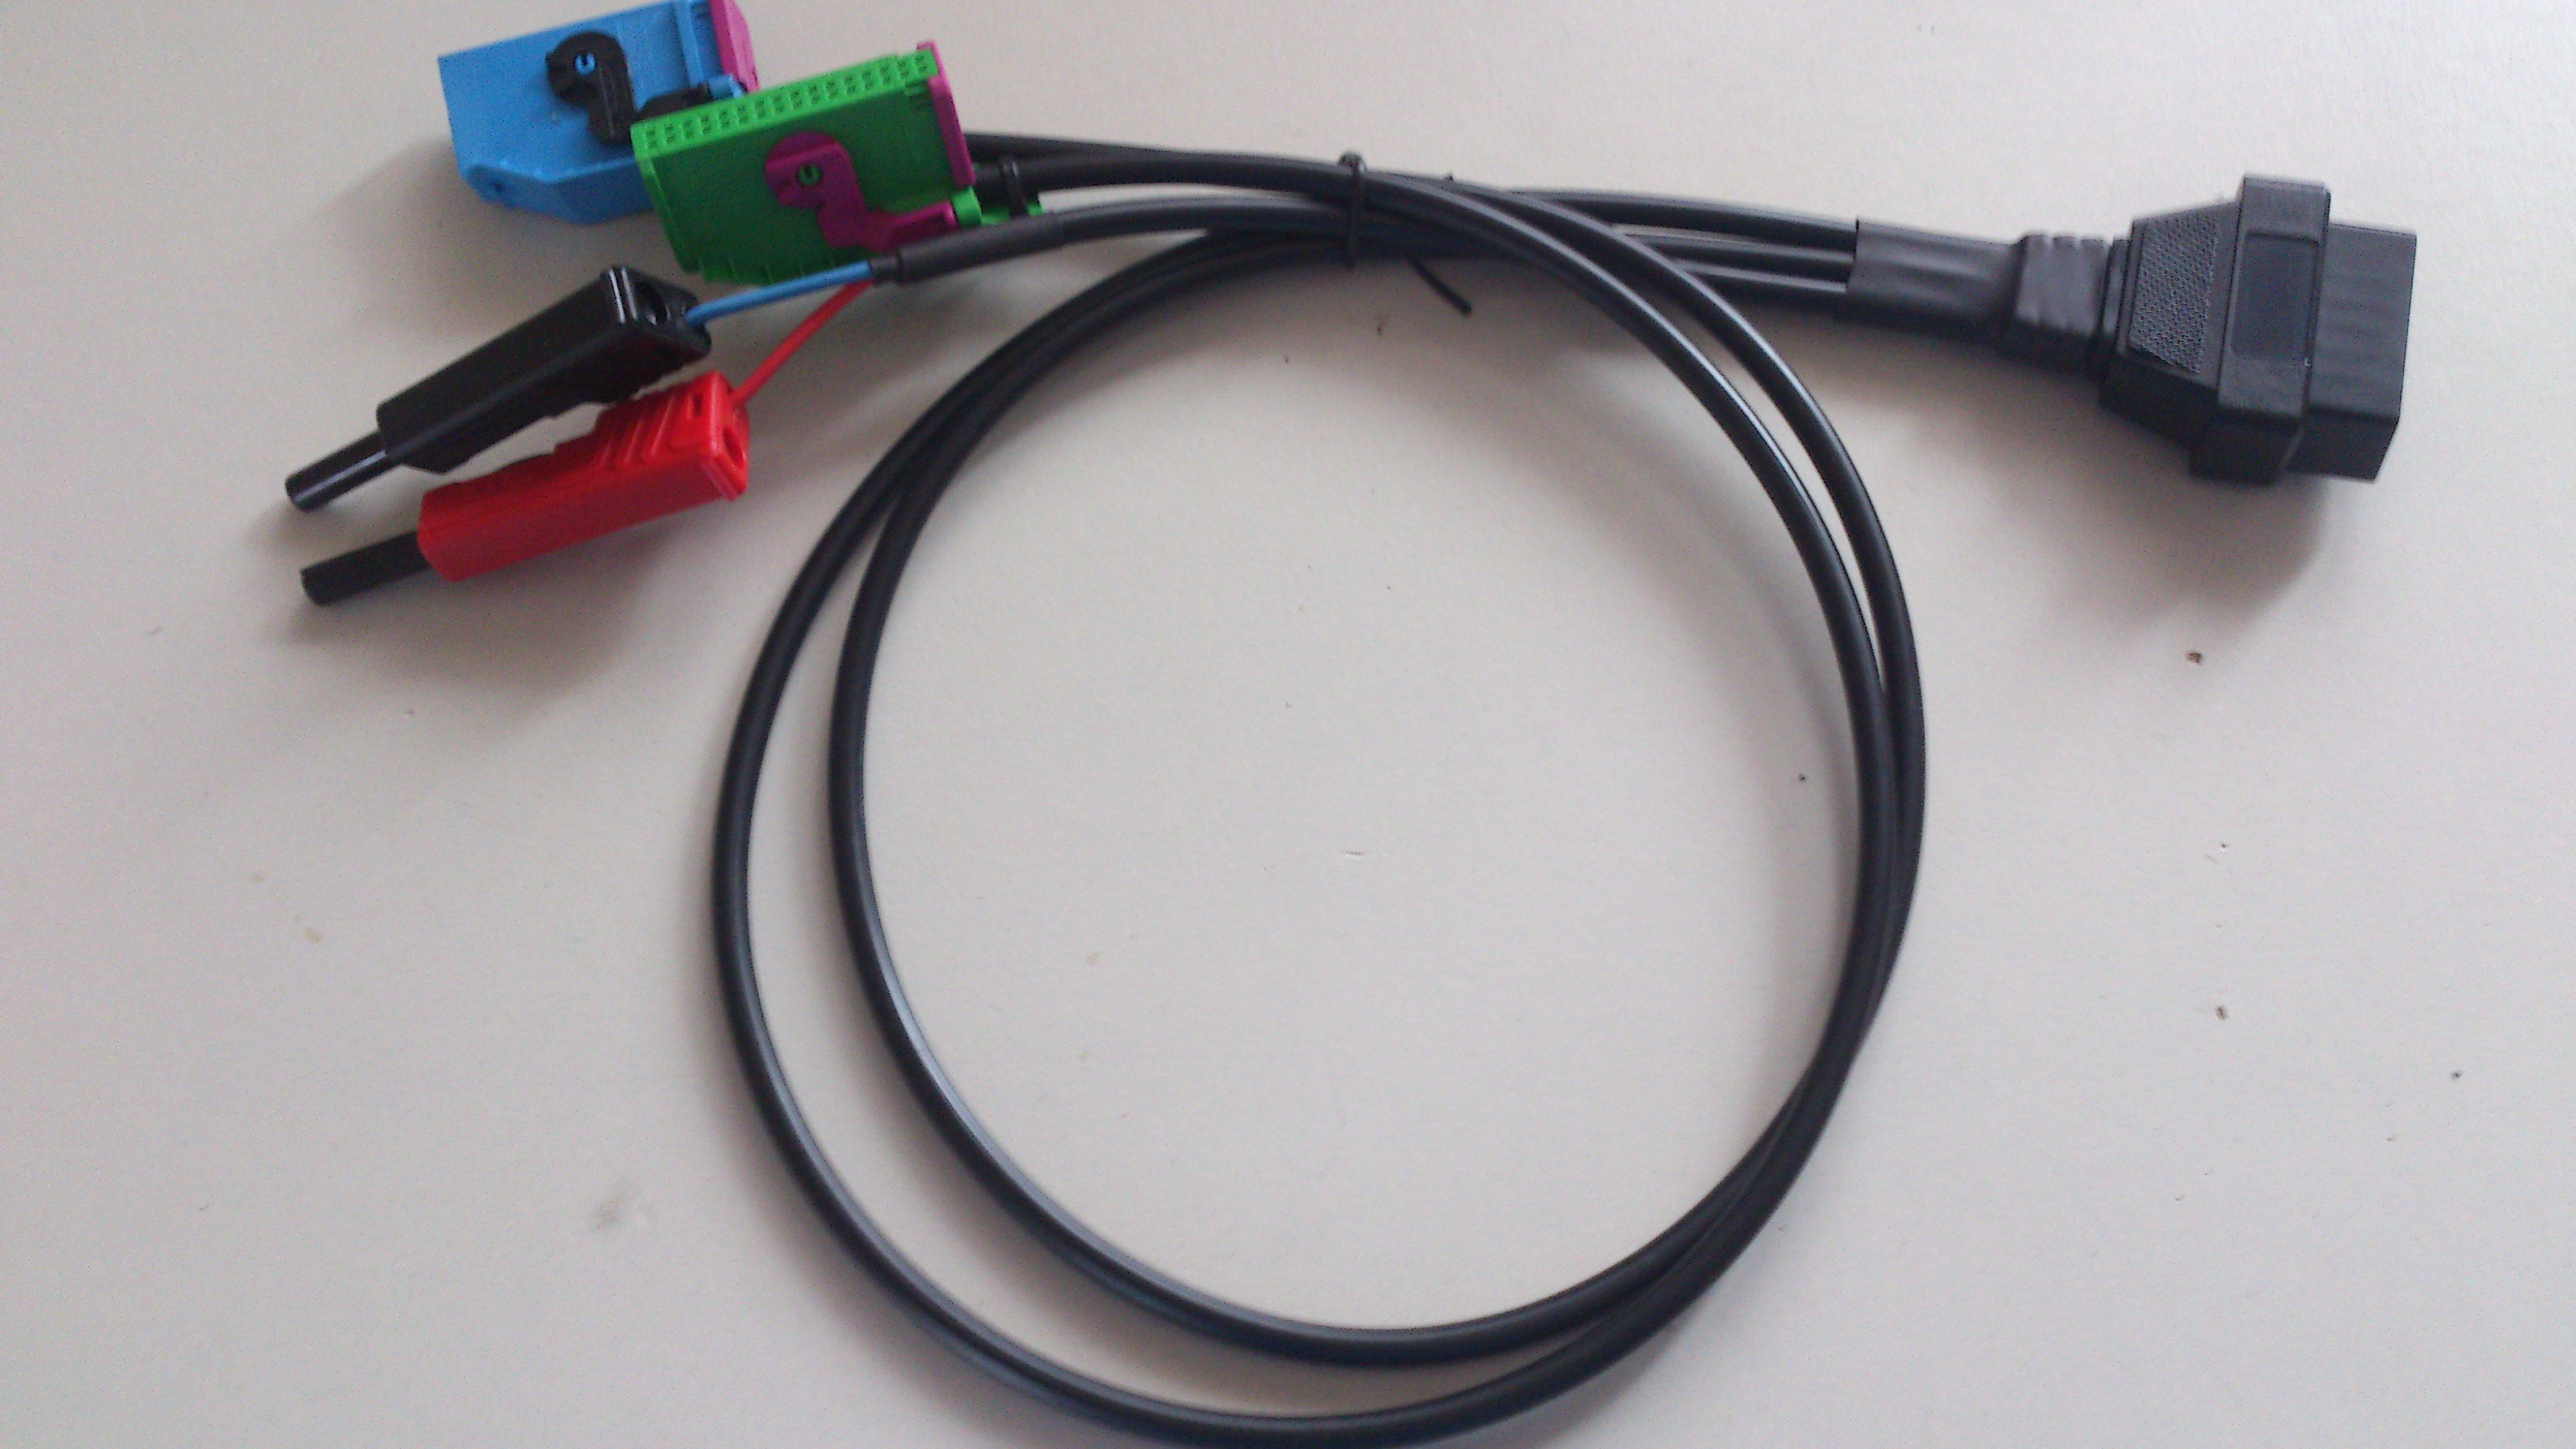 KI_Adapter_Kabel.jpg.1761ede14e2a70fa03e0a5b883f422e1.jpg